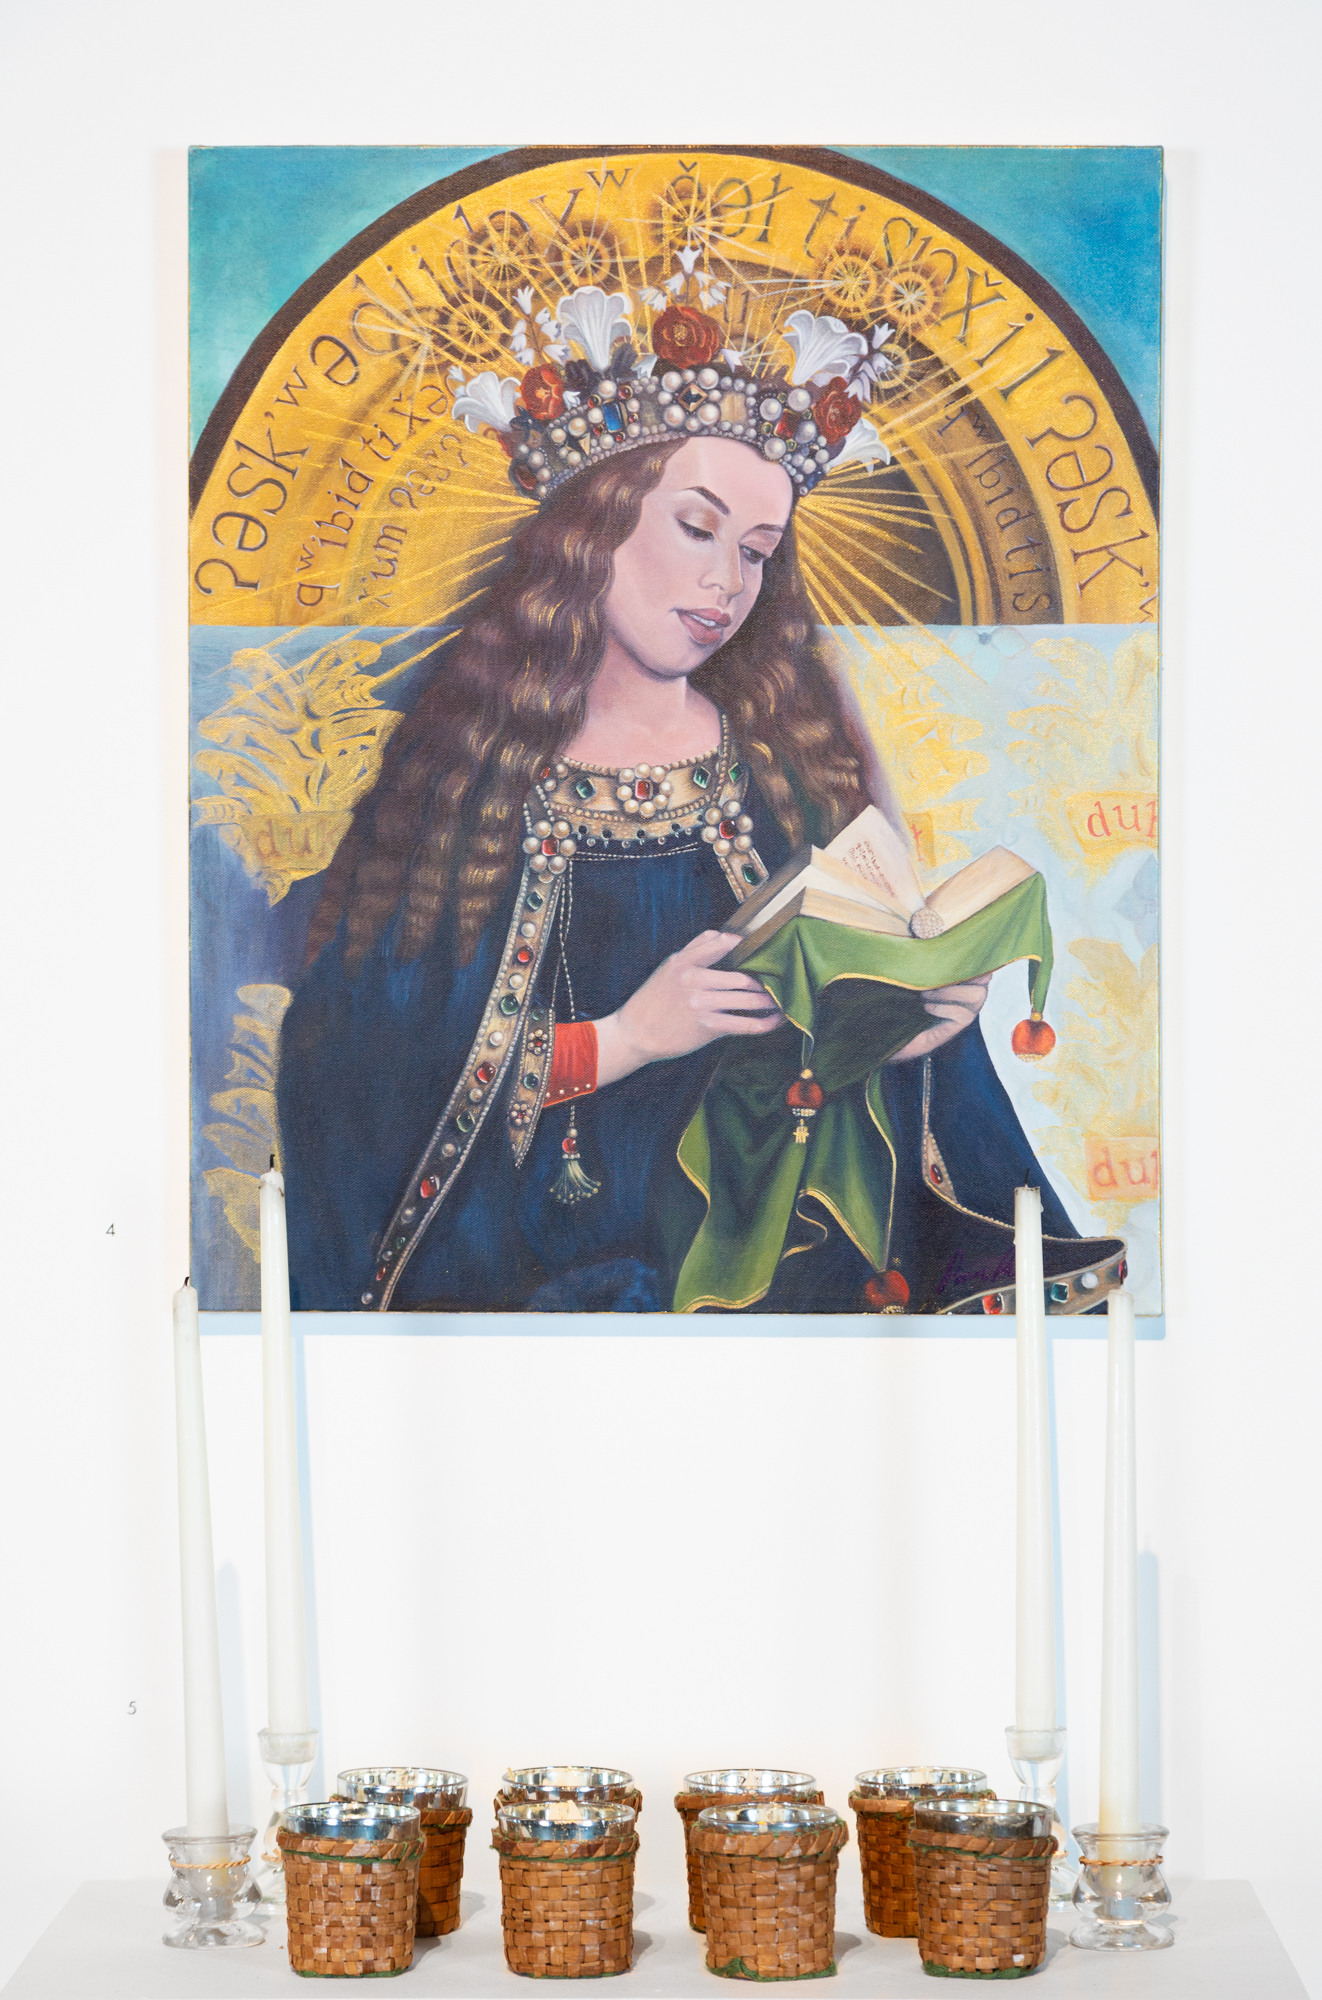 caləɫali altarpiece